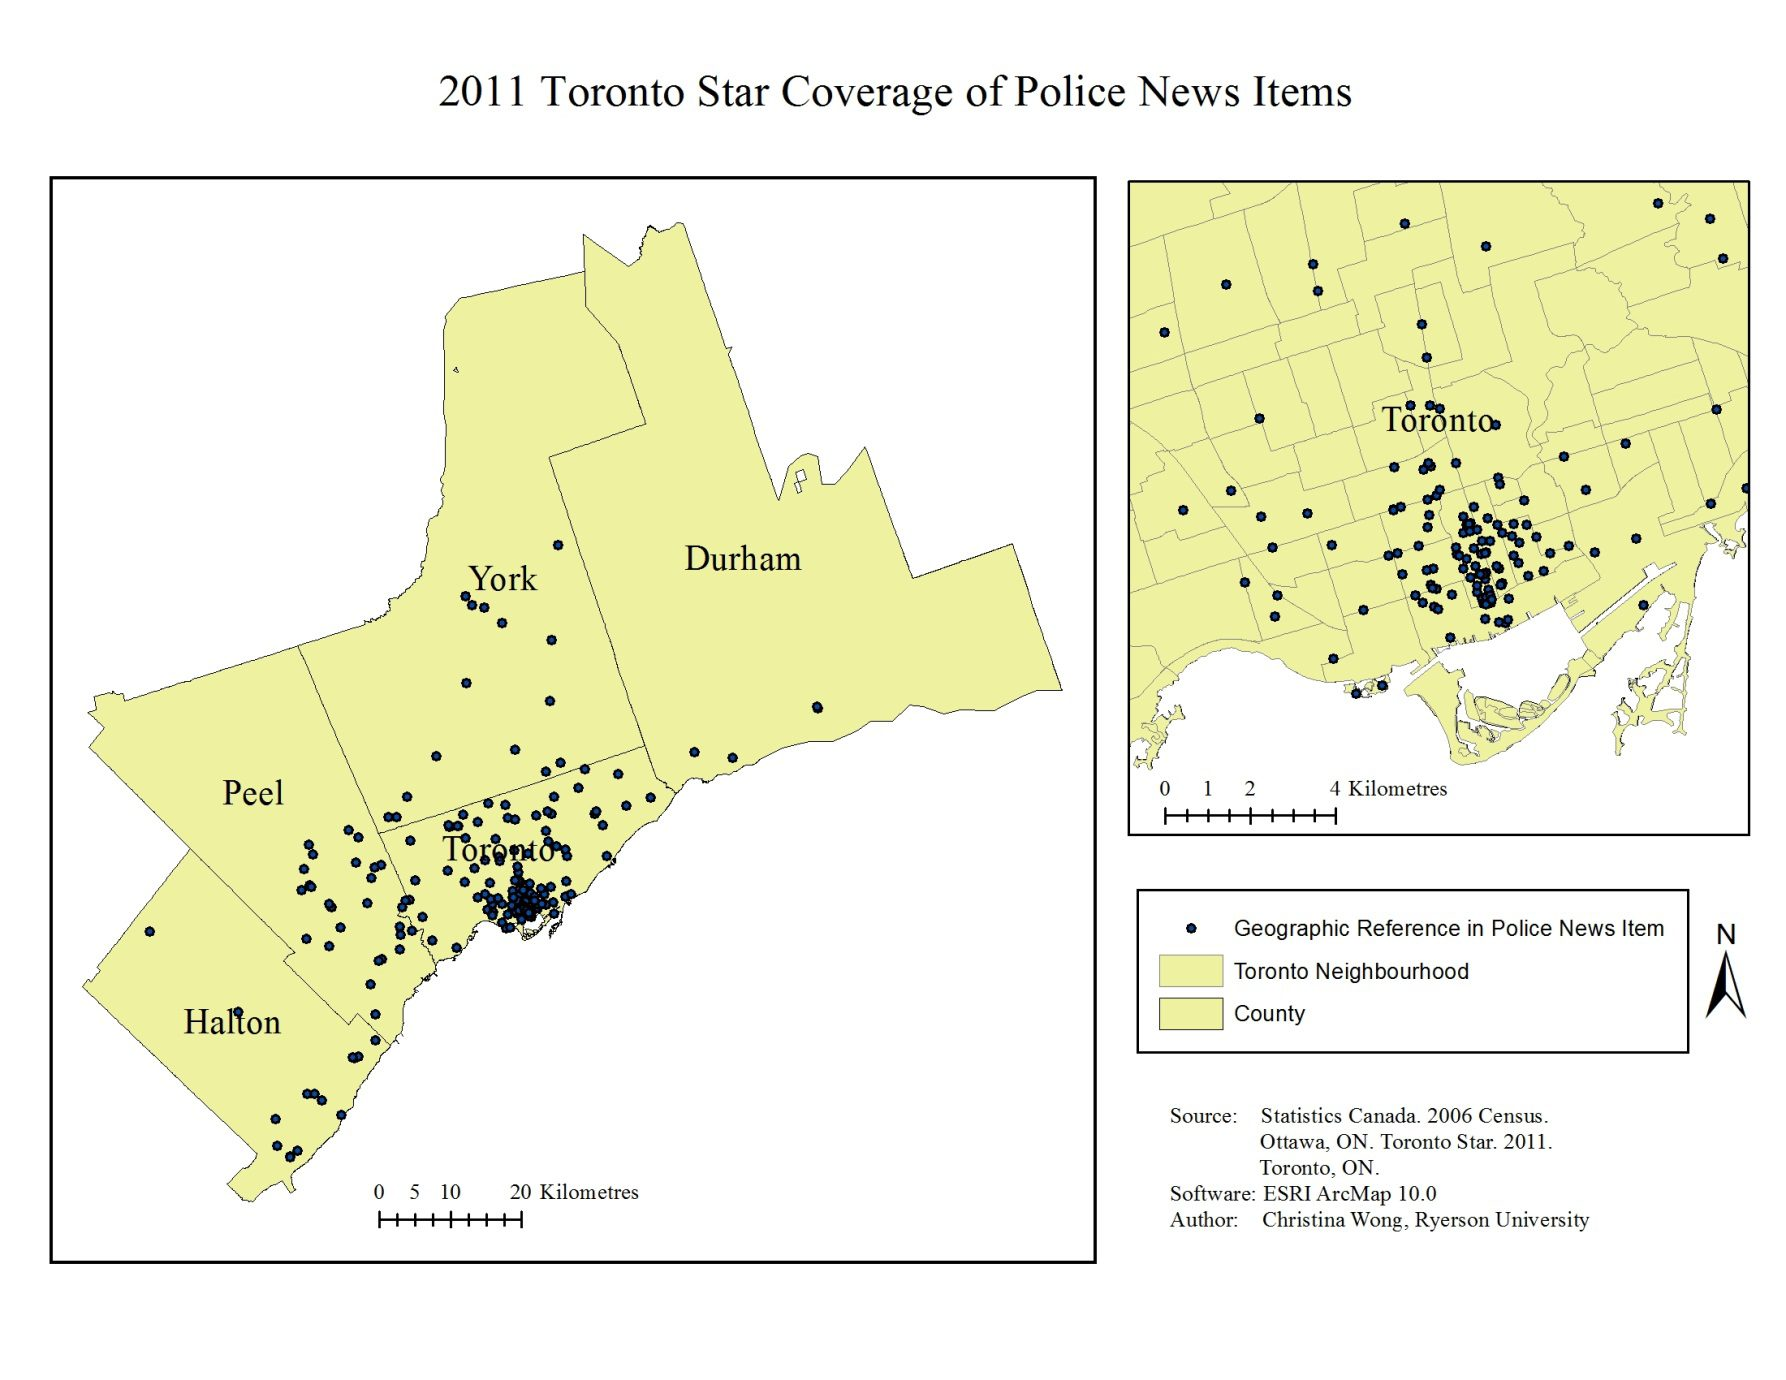 Figure 1. Toronto Star crime coverage